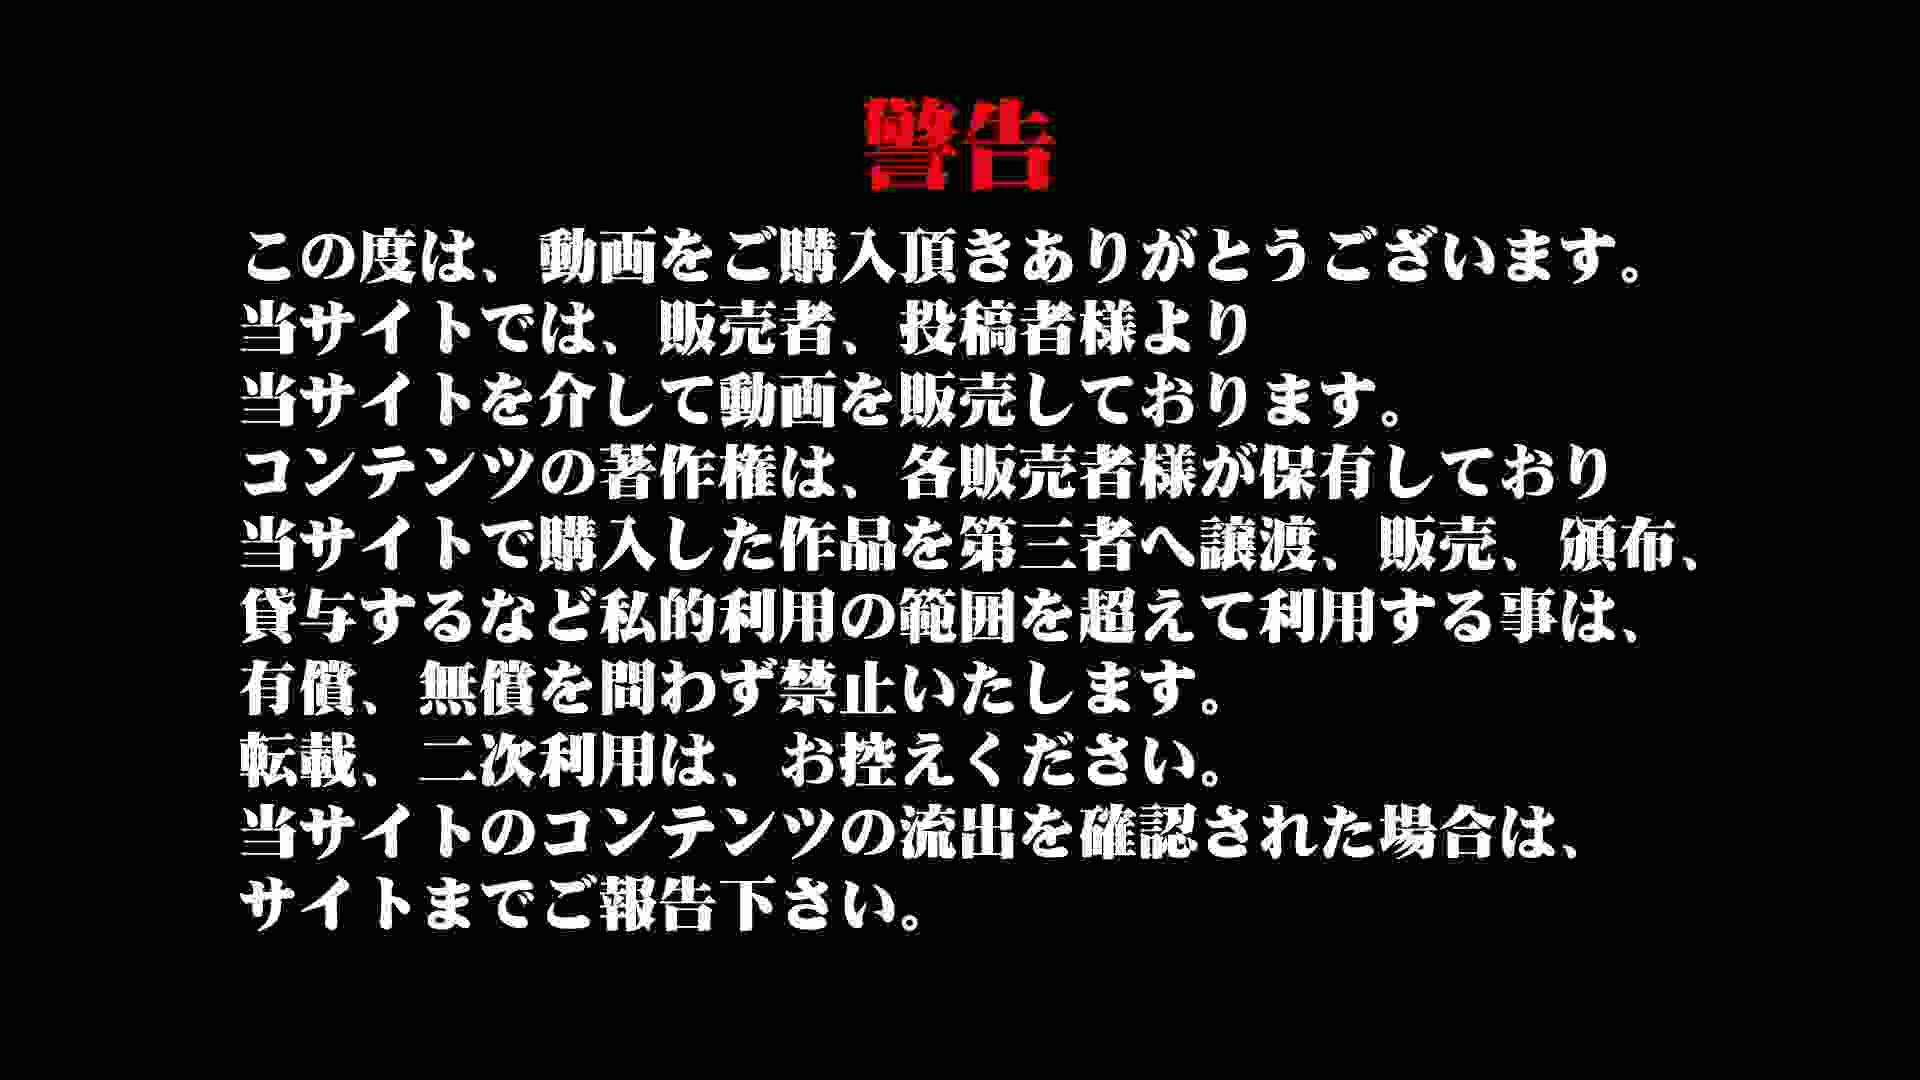 Aquaな露天風呂Vol.919 盗撮 おまんこ無修正動画無料 91連発 2